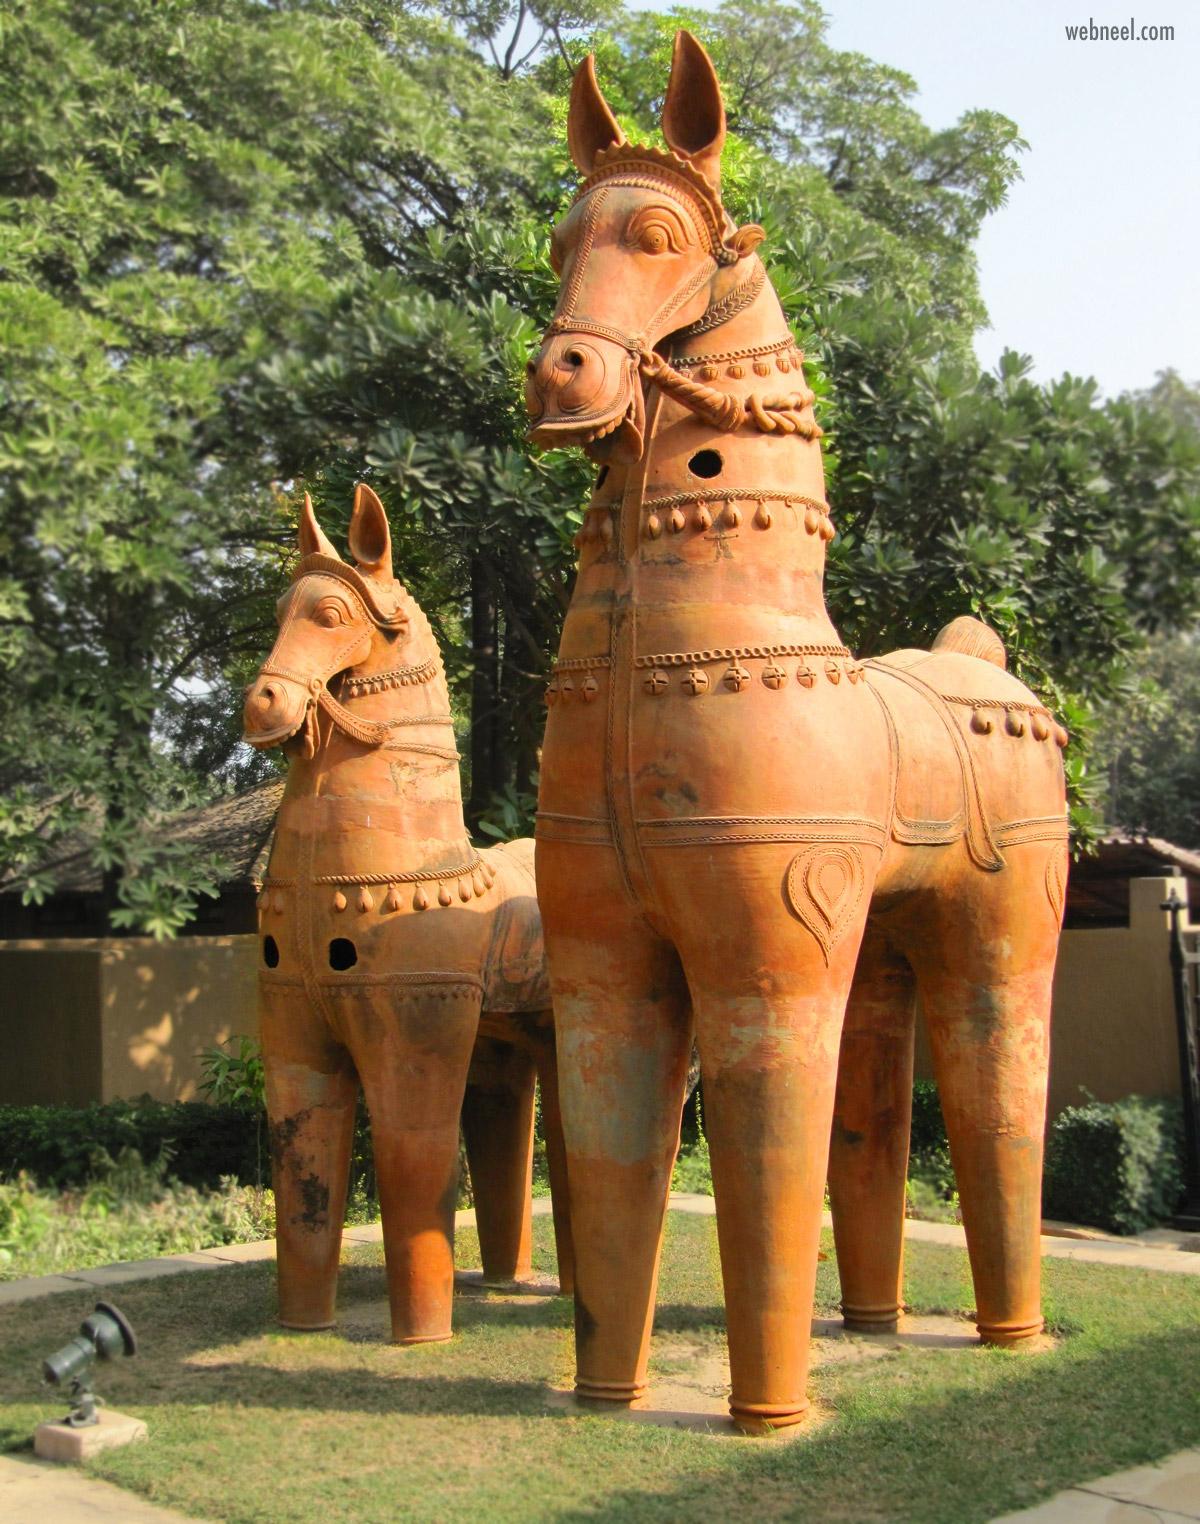 terracotta sculpture horse big outdoor